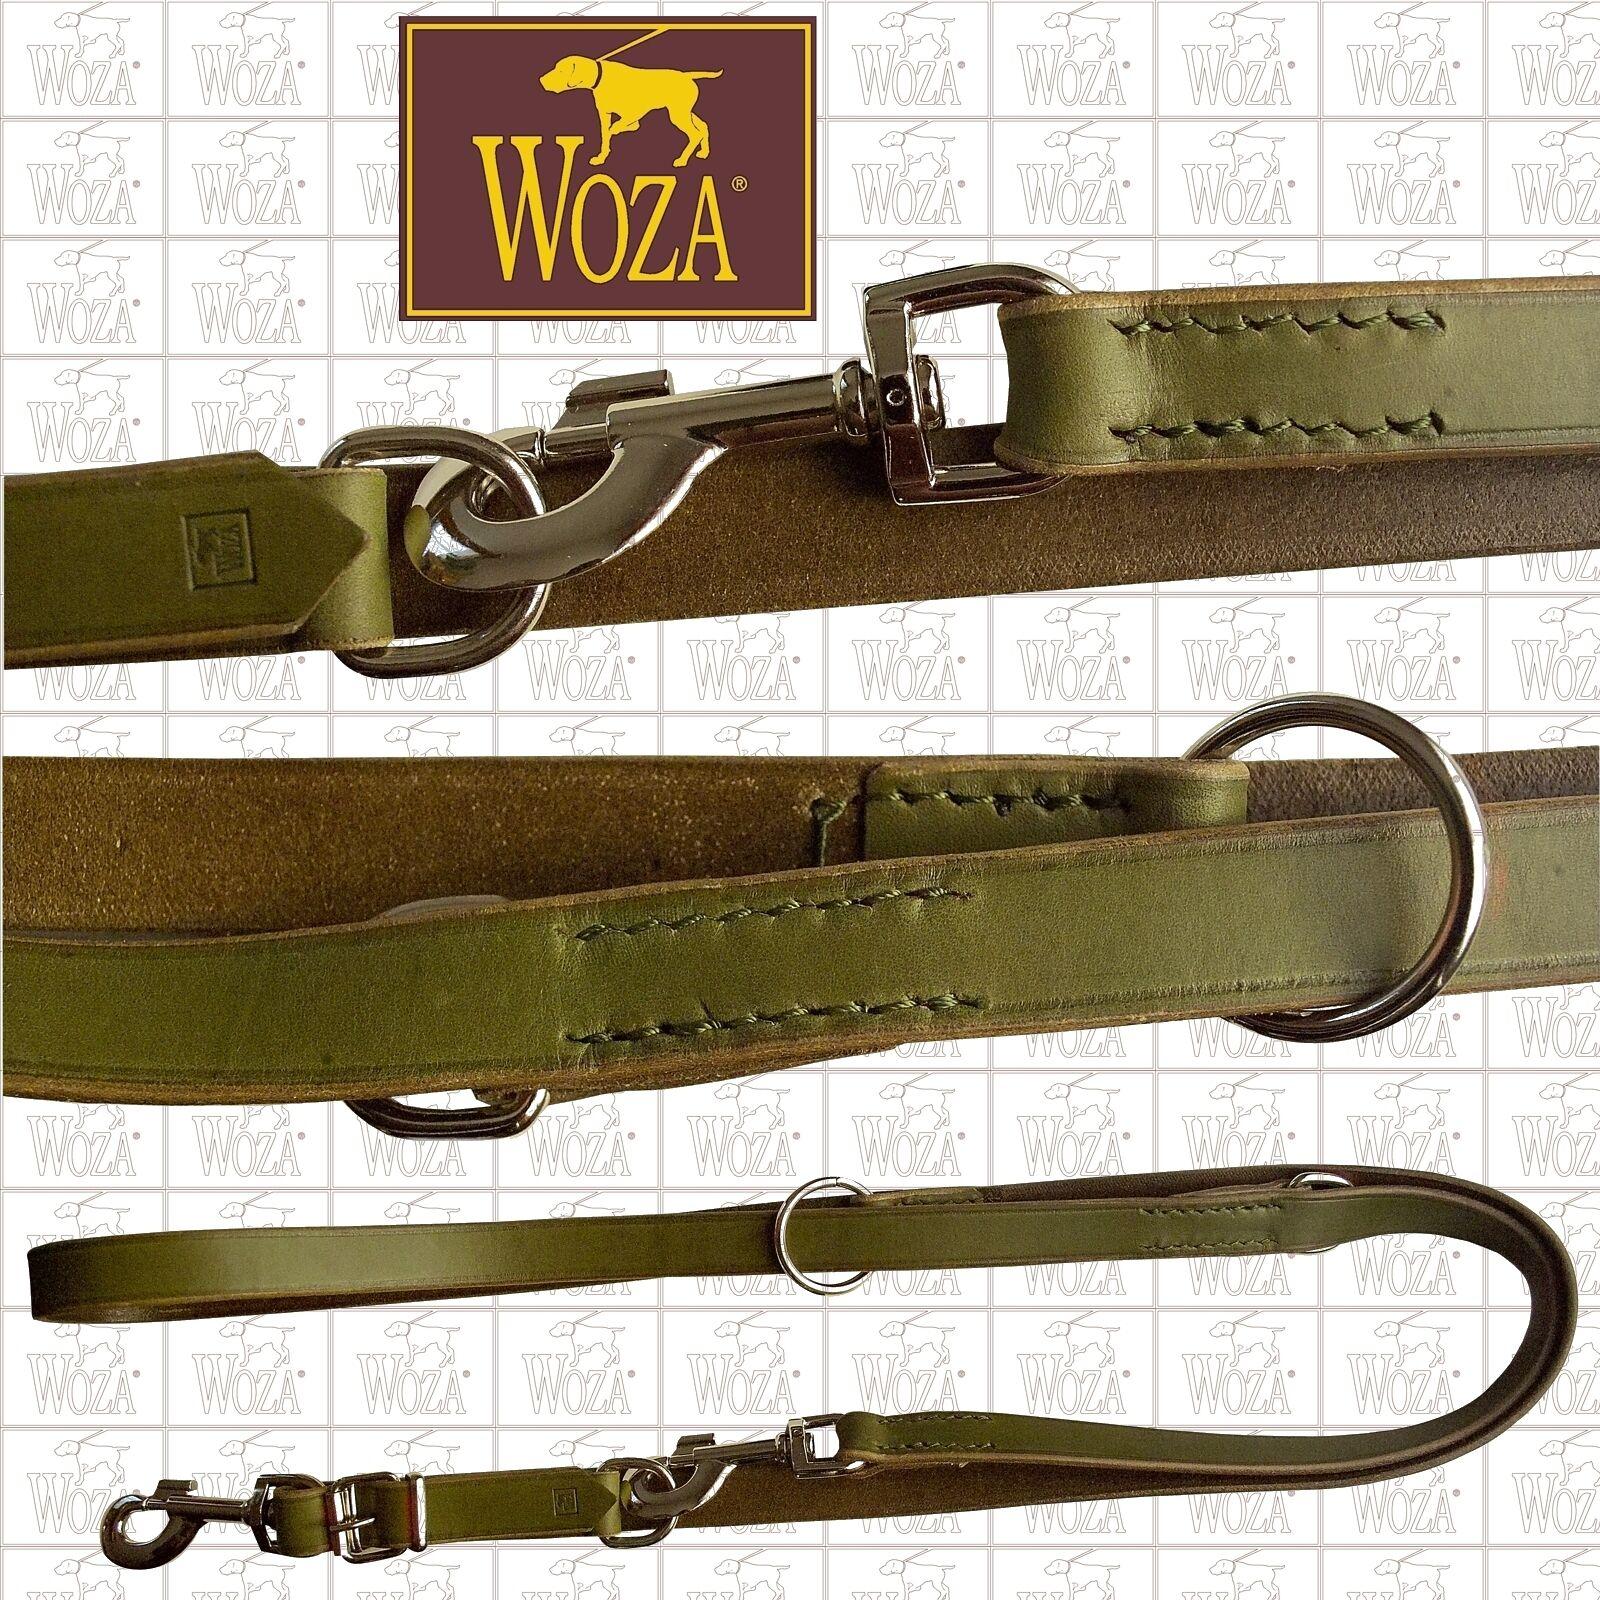 WOZA Premium Hundeleine Hundeleine Hundeleine Handgenäht Vollleder Rindlederleine Runde Kanten L42177  | Spezielle Funktion  094d7e